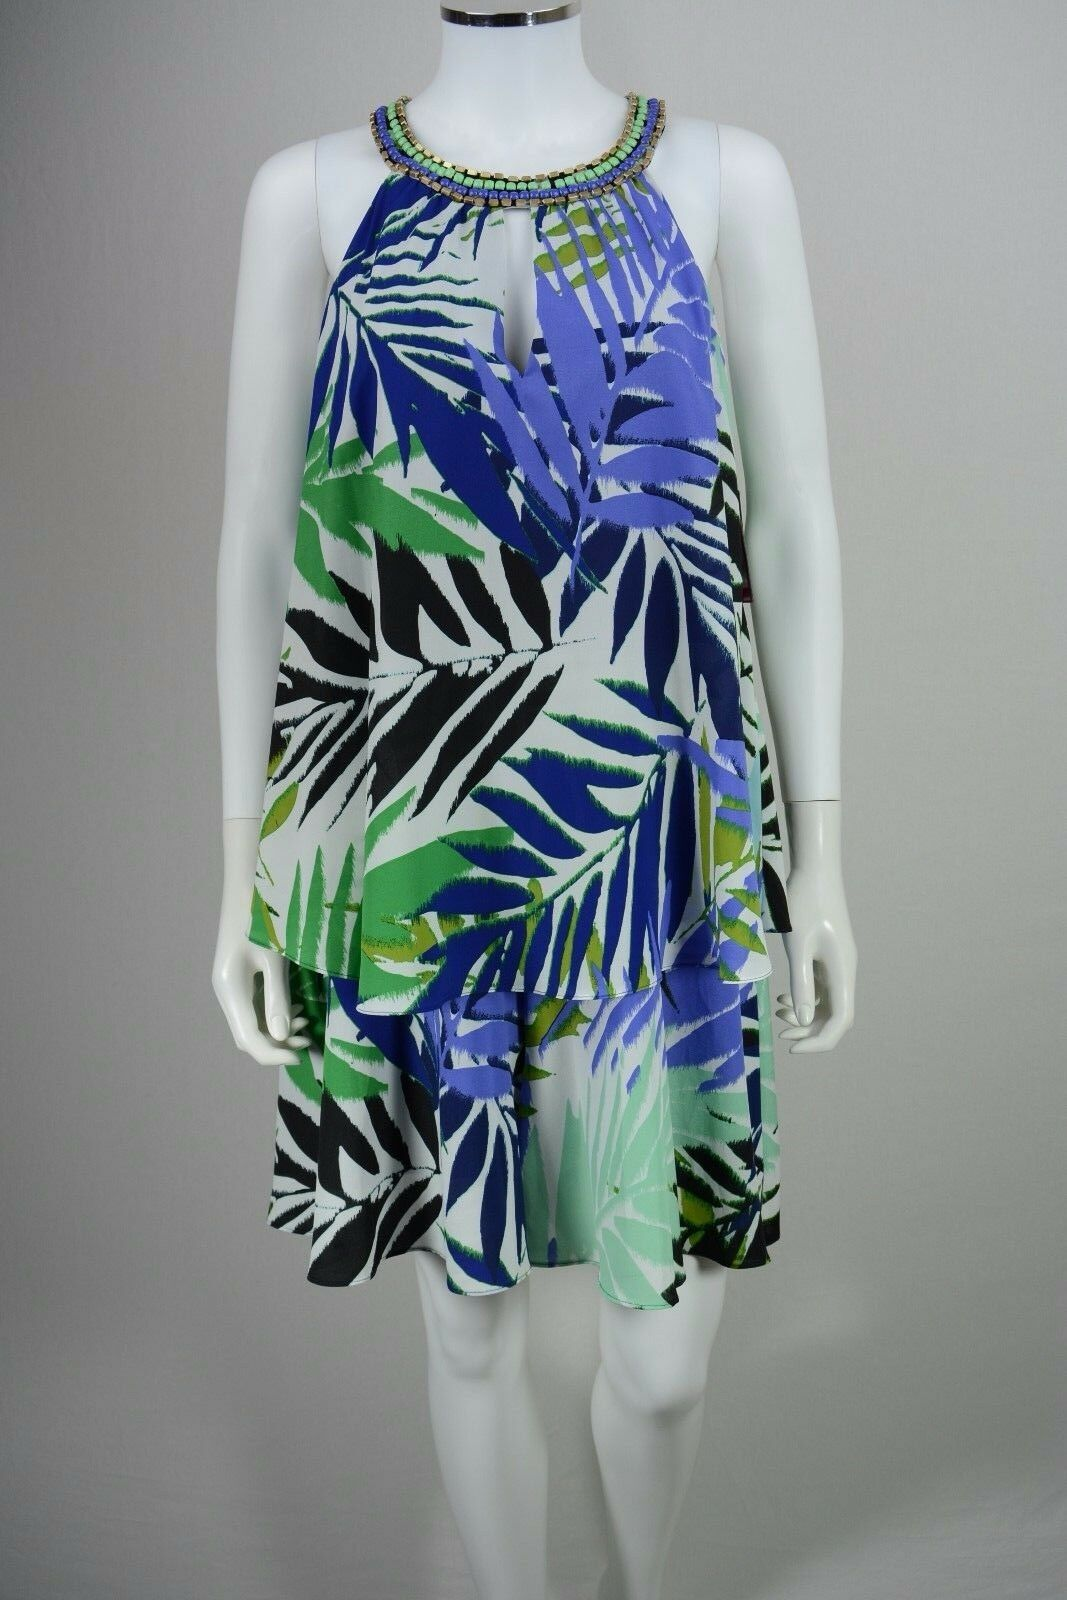 Women's Vince Camuto size 8 bluee Floral Beaded Halter Romper Skort Dress NWT